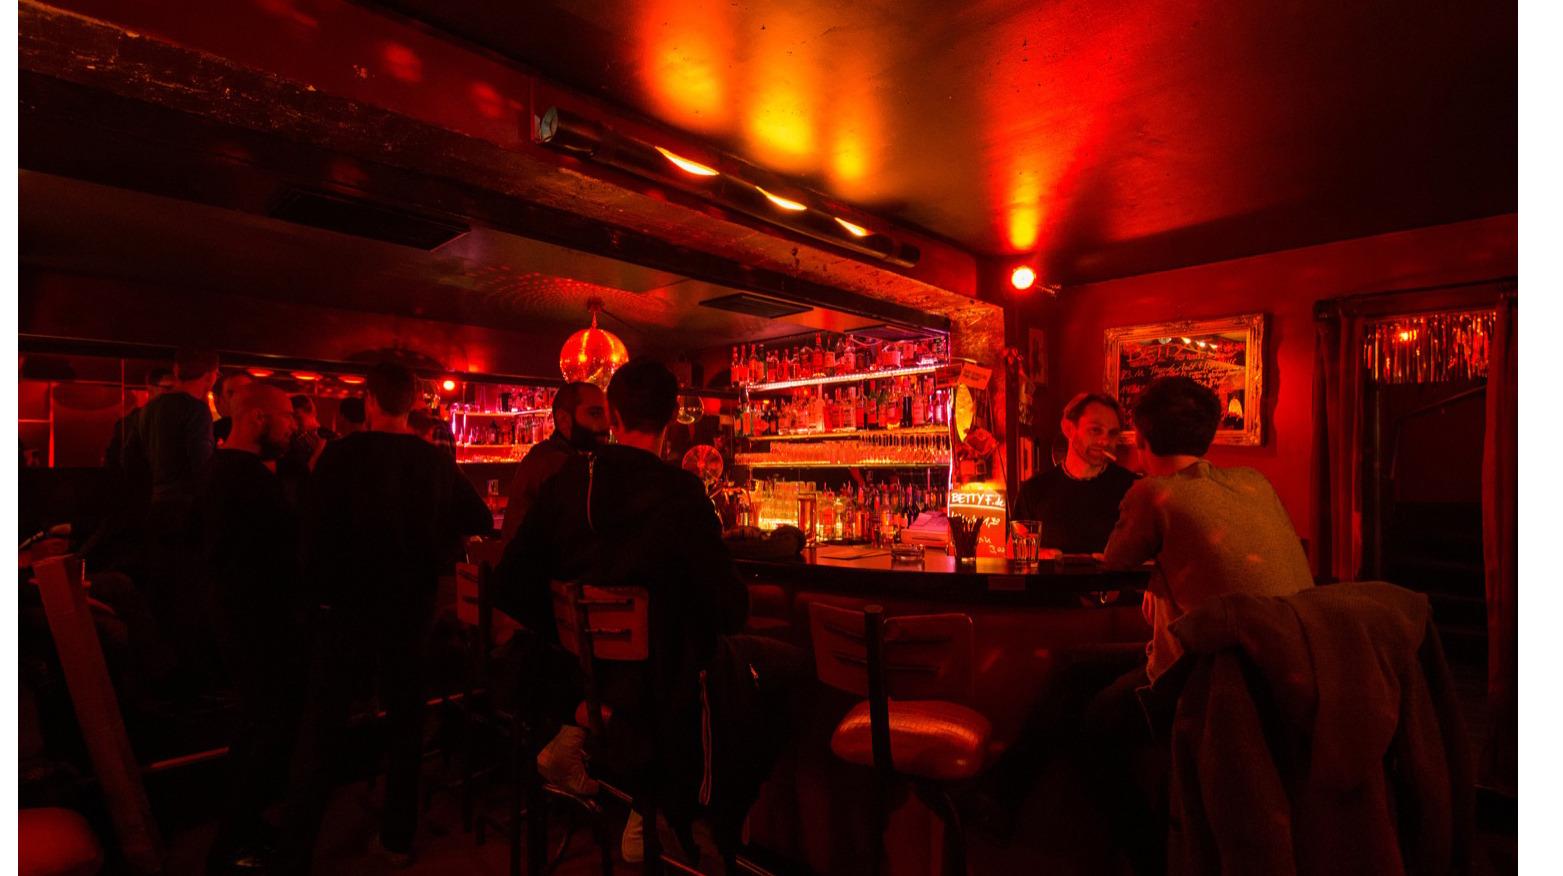 Betty F***, Bars, Berlin